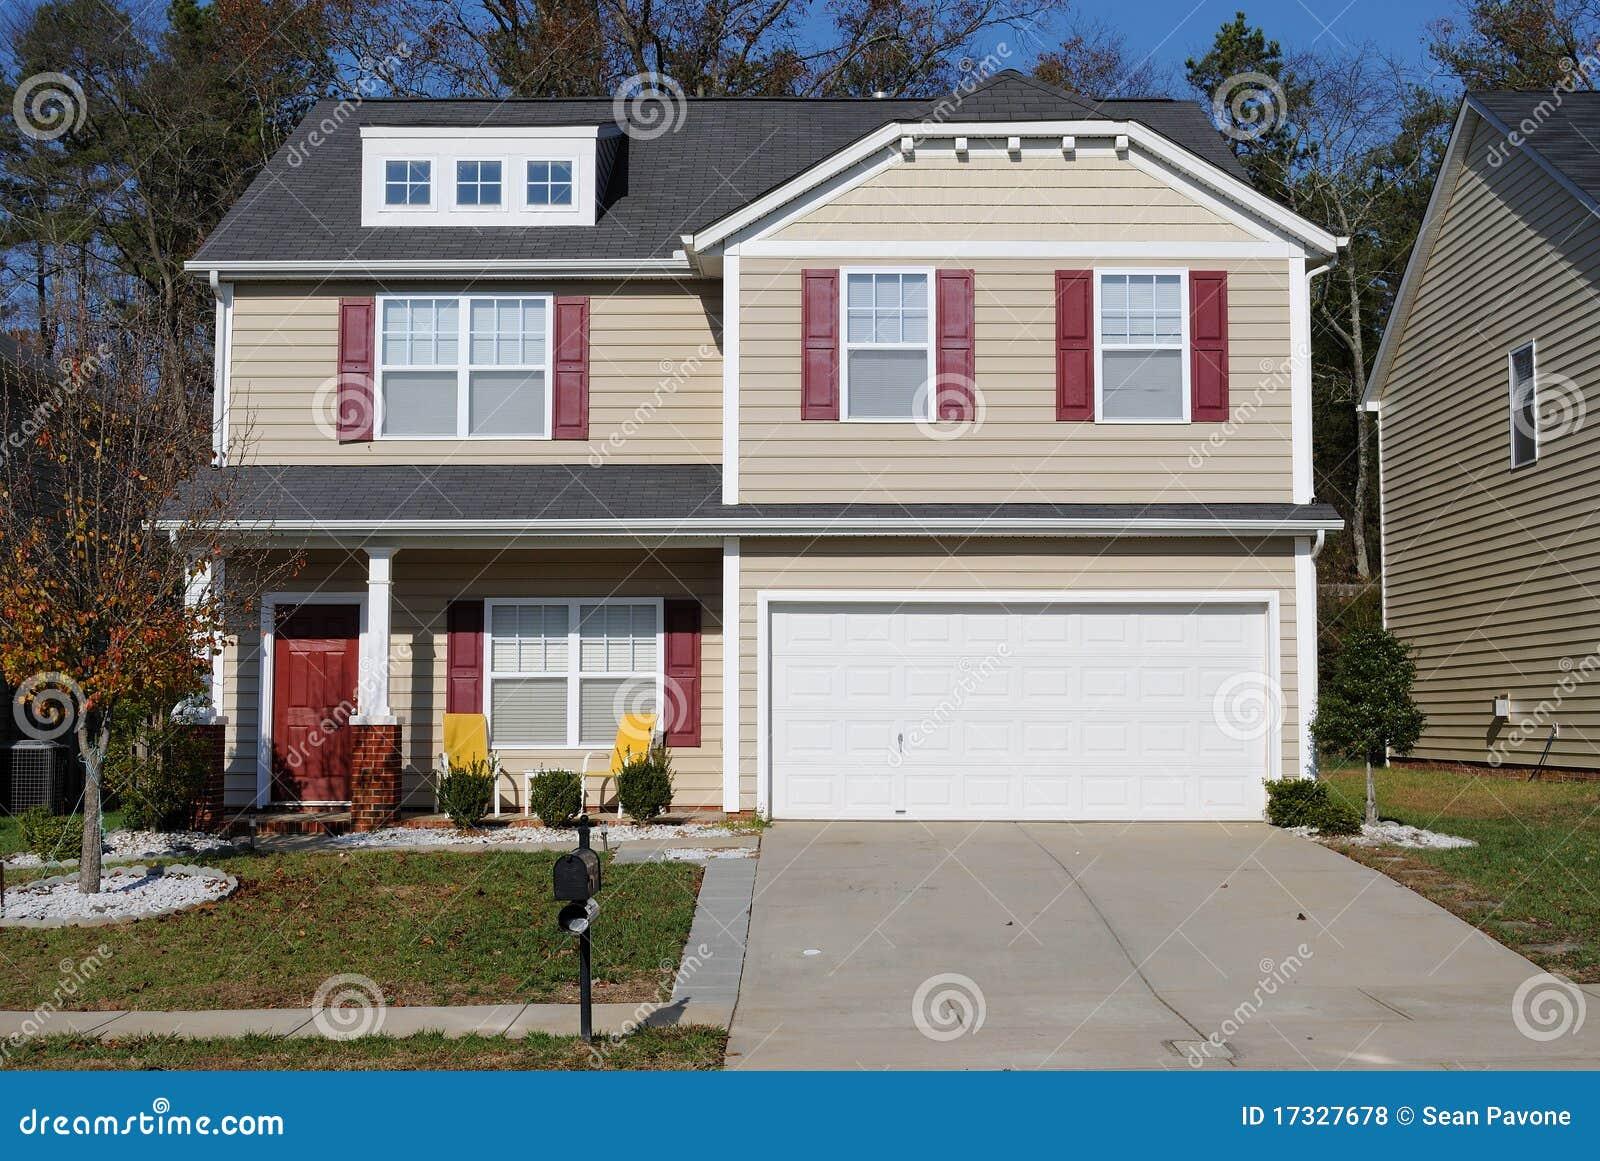 Suburban Home Royalty Free Stock Photos Image 17327678